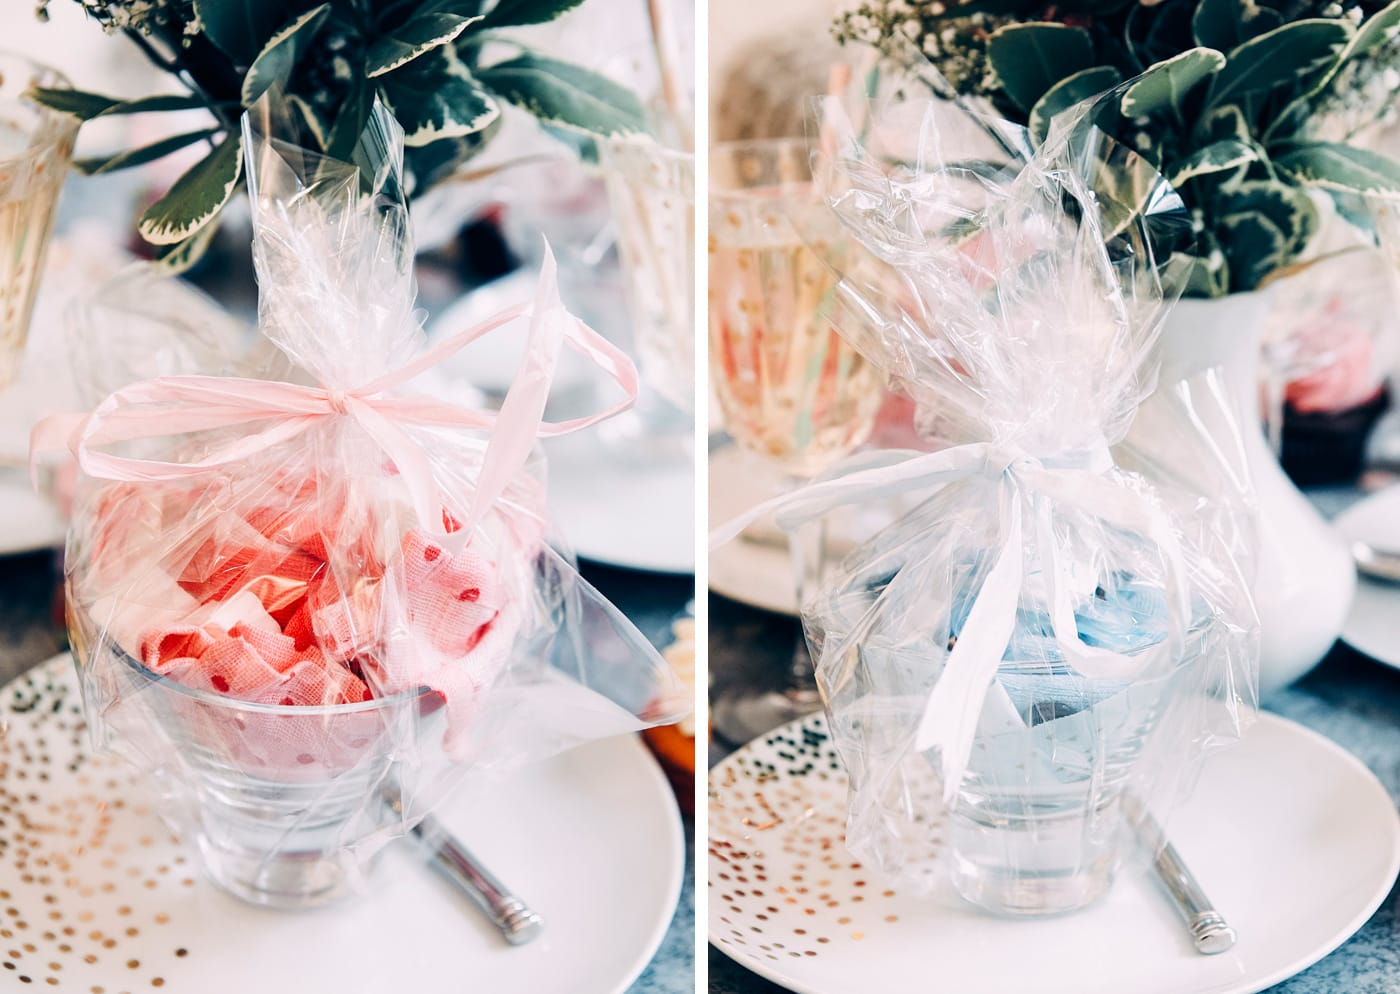 DIY-Ideen von Roombeez für die Babyparty: Cupcakes // HIMBEER